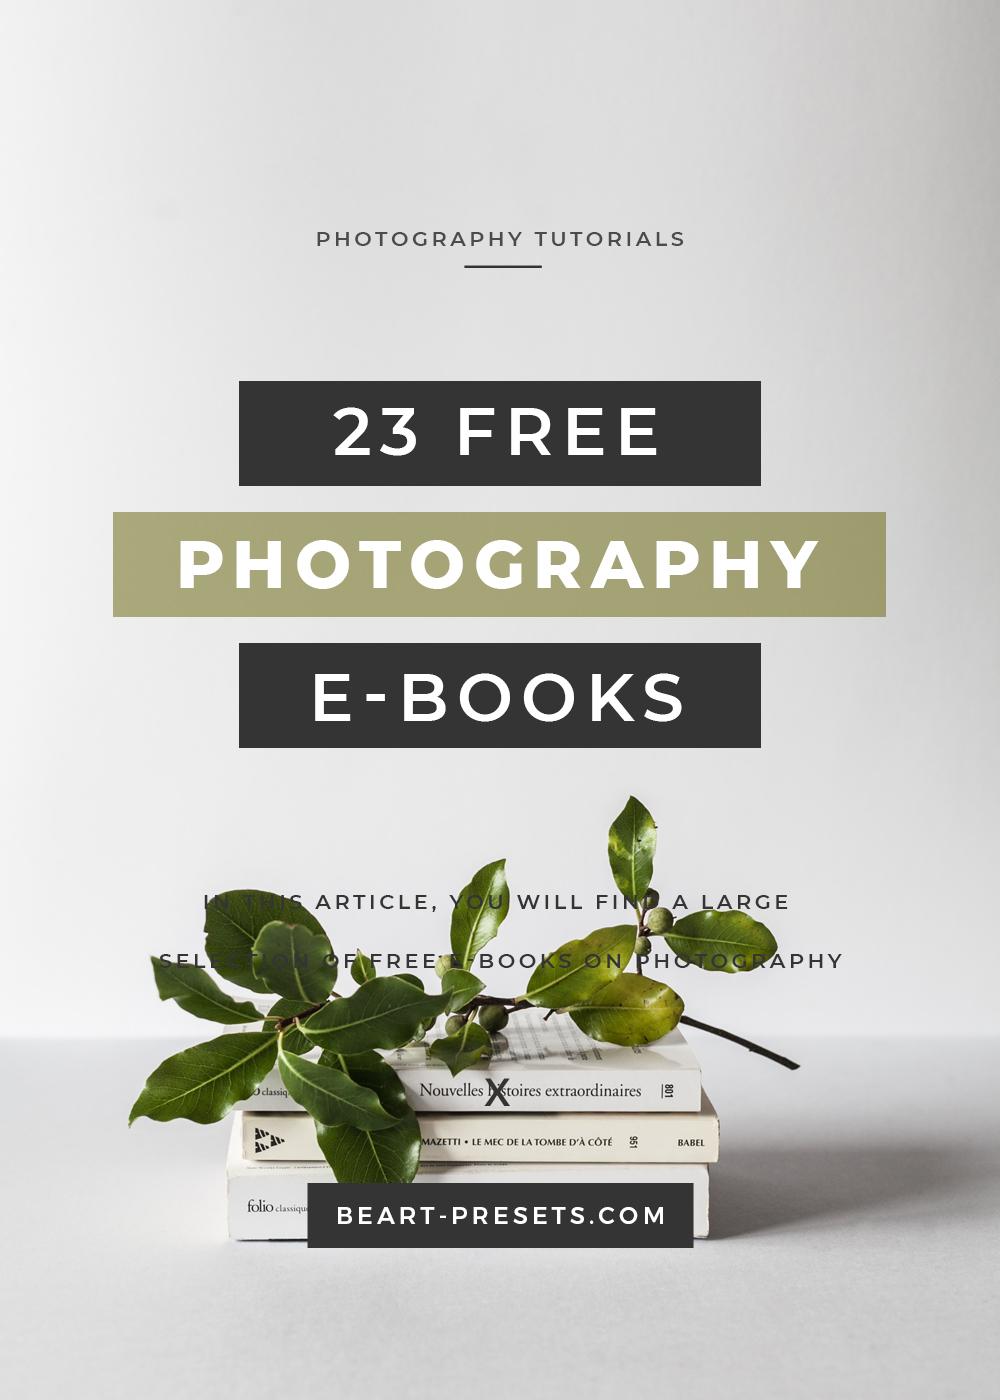 23 free photo books